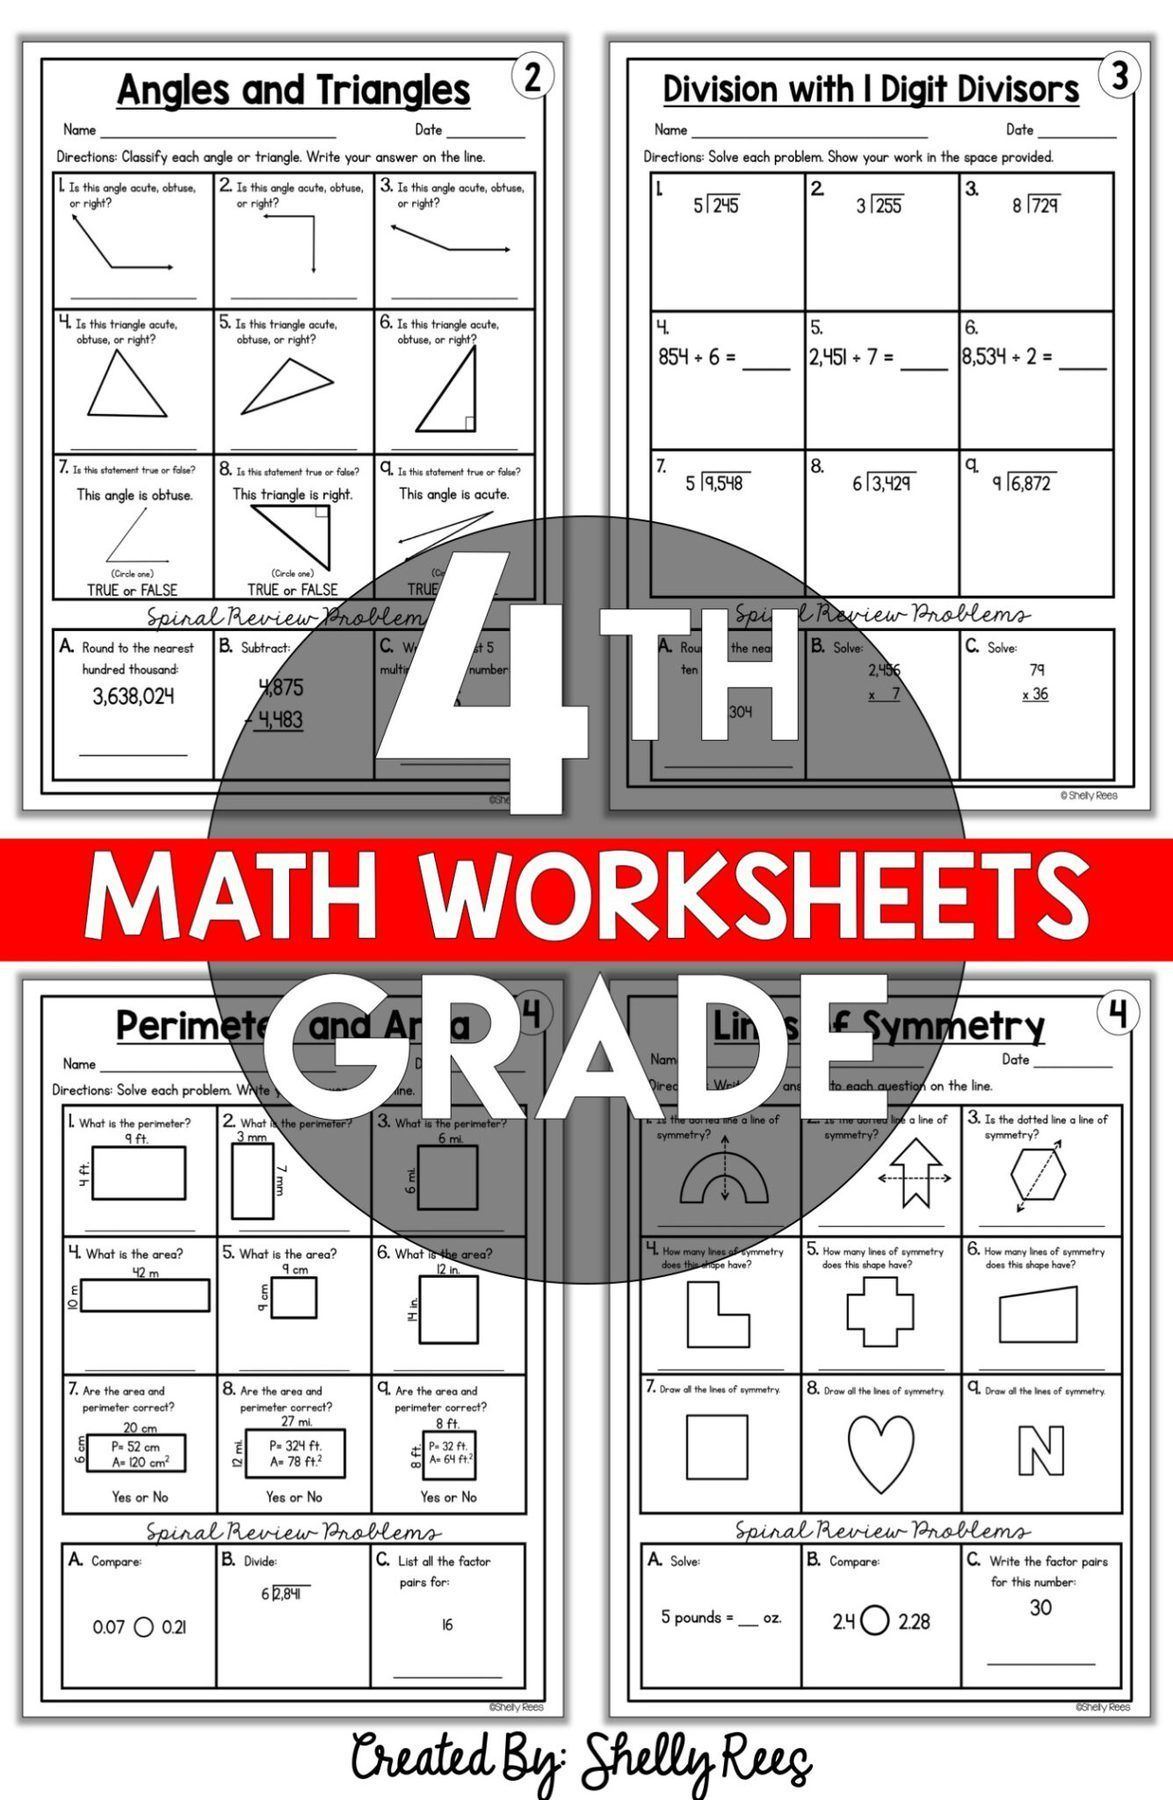 4th Grade Math Worksheets Free and Printable - Appletastic Learning   4th  grade math worksheets [ 1800 x 1173 Pixel ]